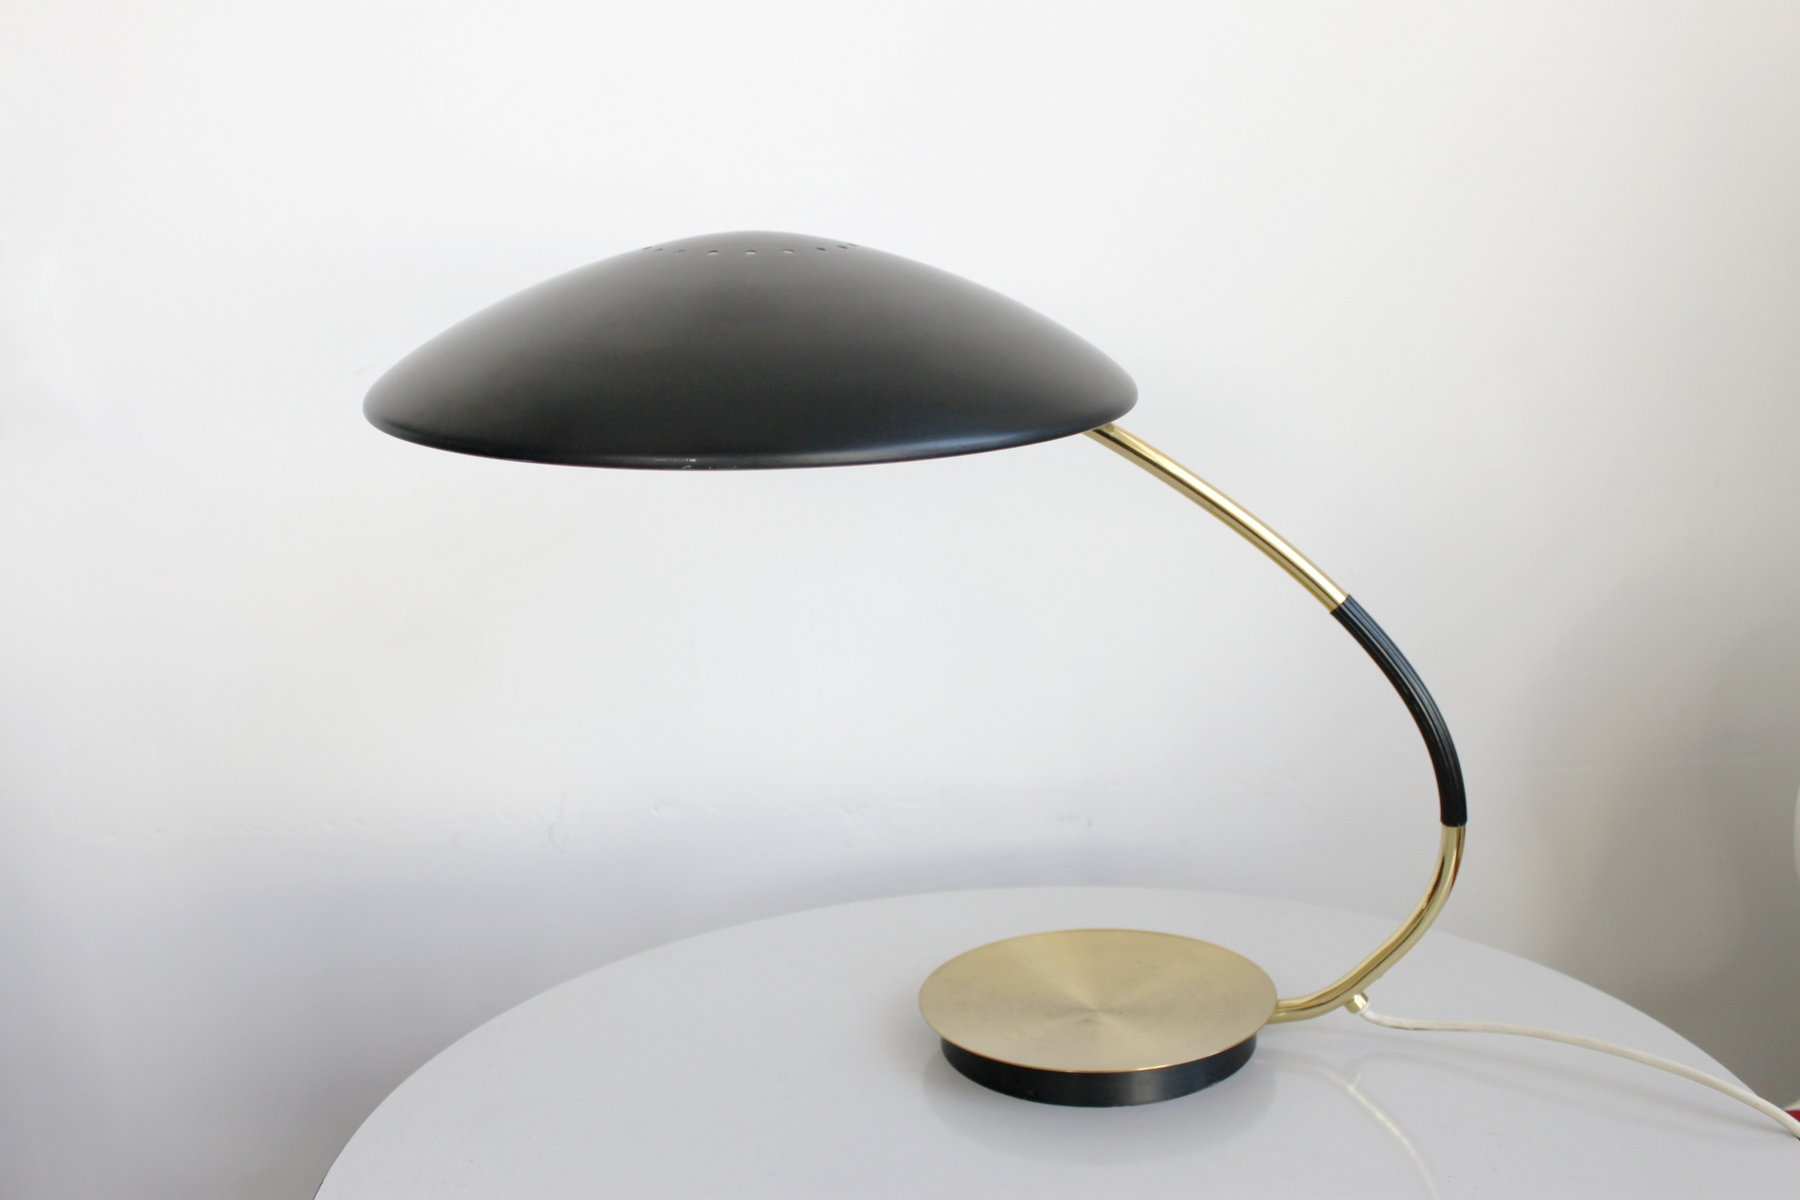 6787 table lamp by christian dell for kaiser leuchten. Black Bedroom Furniture Sets. Home Design Ideas